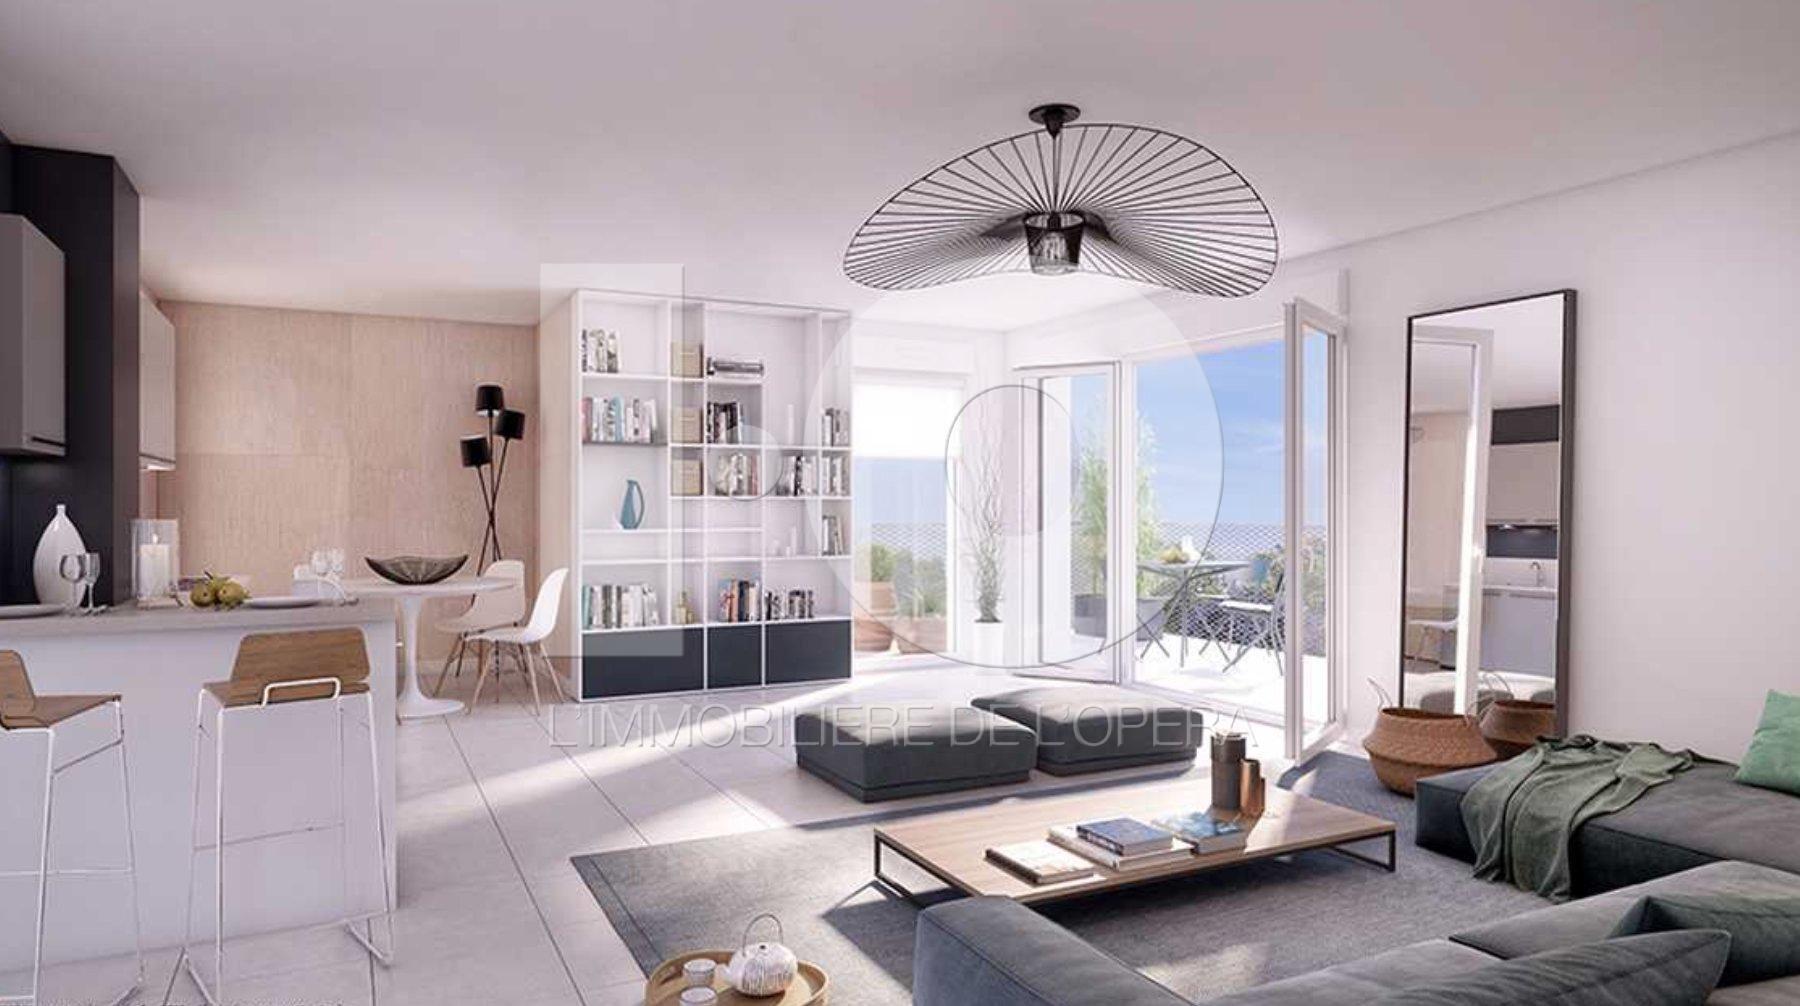 CAGNES S/ MER - SUPERBE Appartement 4 Pièces, Terrasses